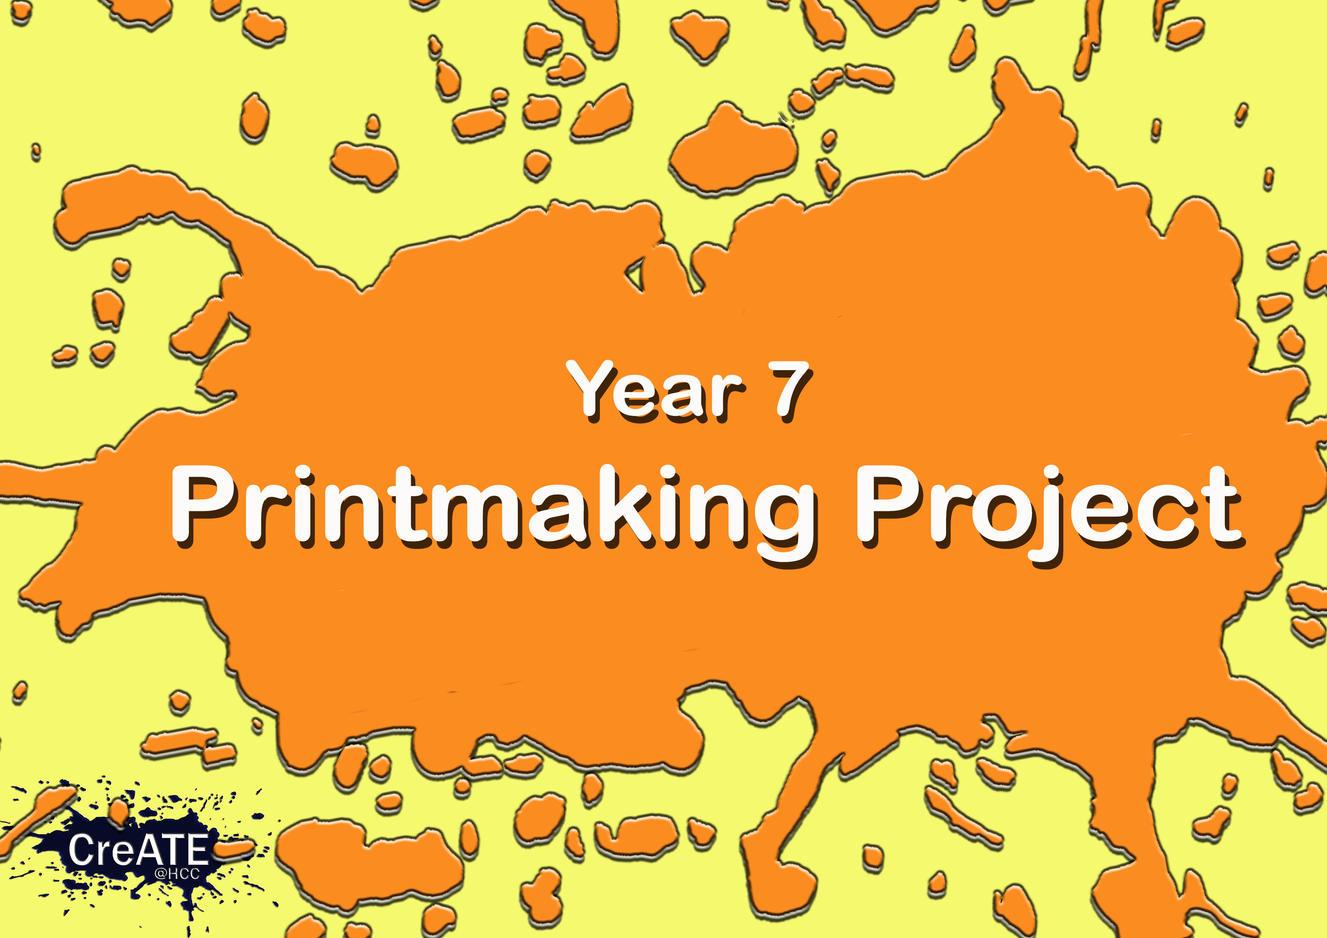 Year 7 Printmaking Project